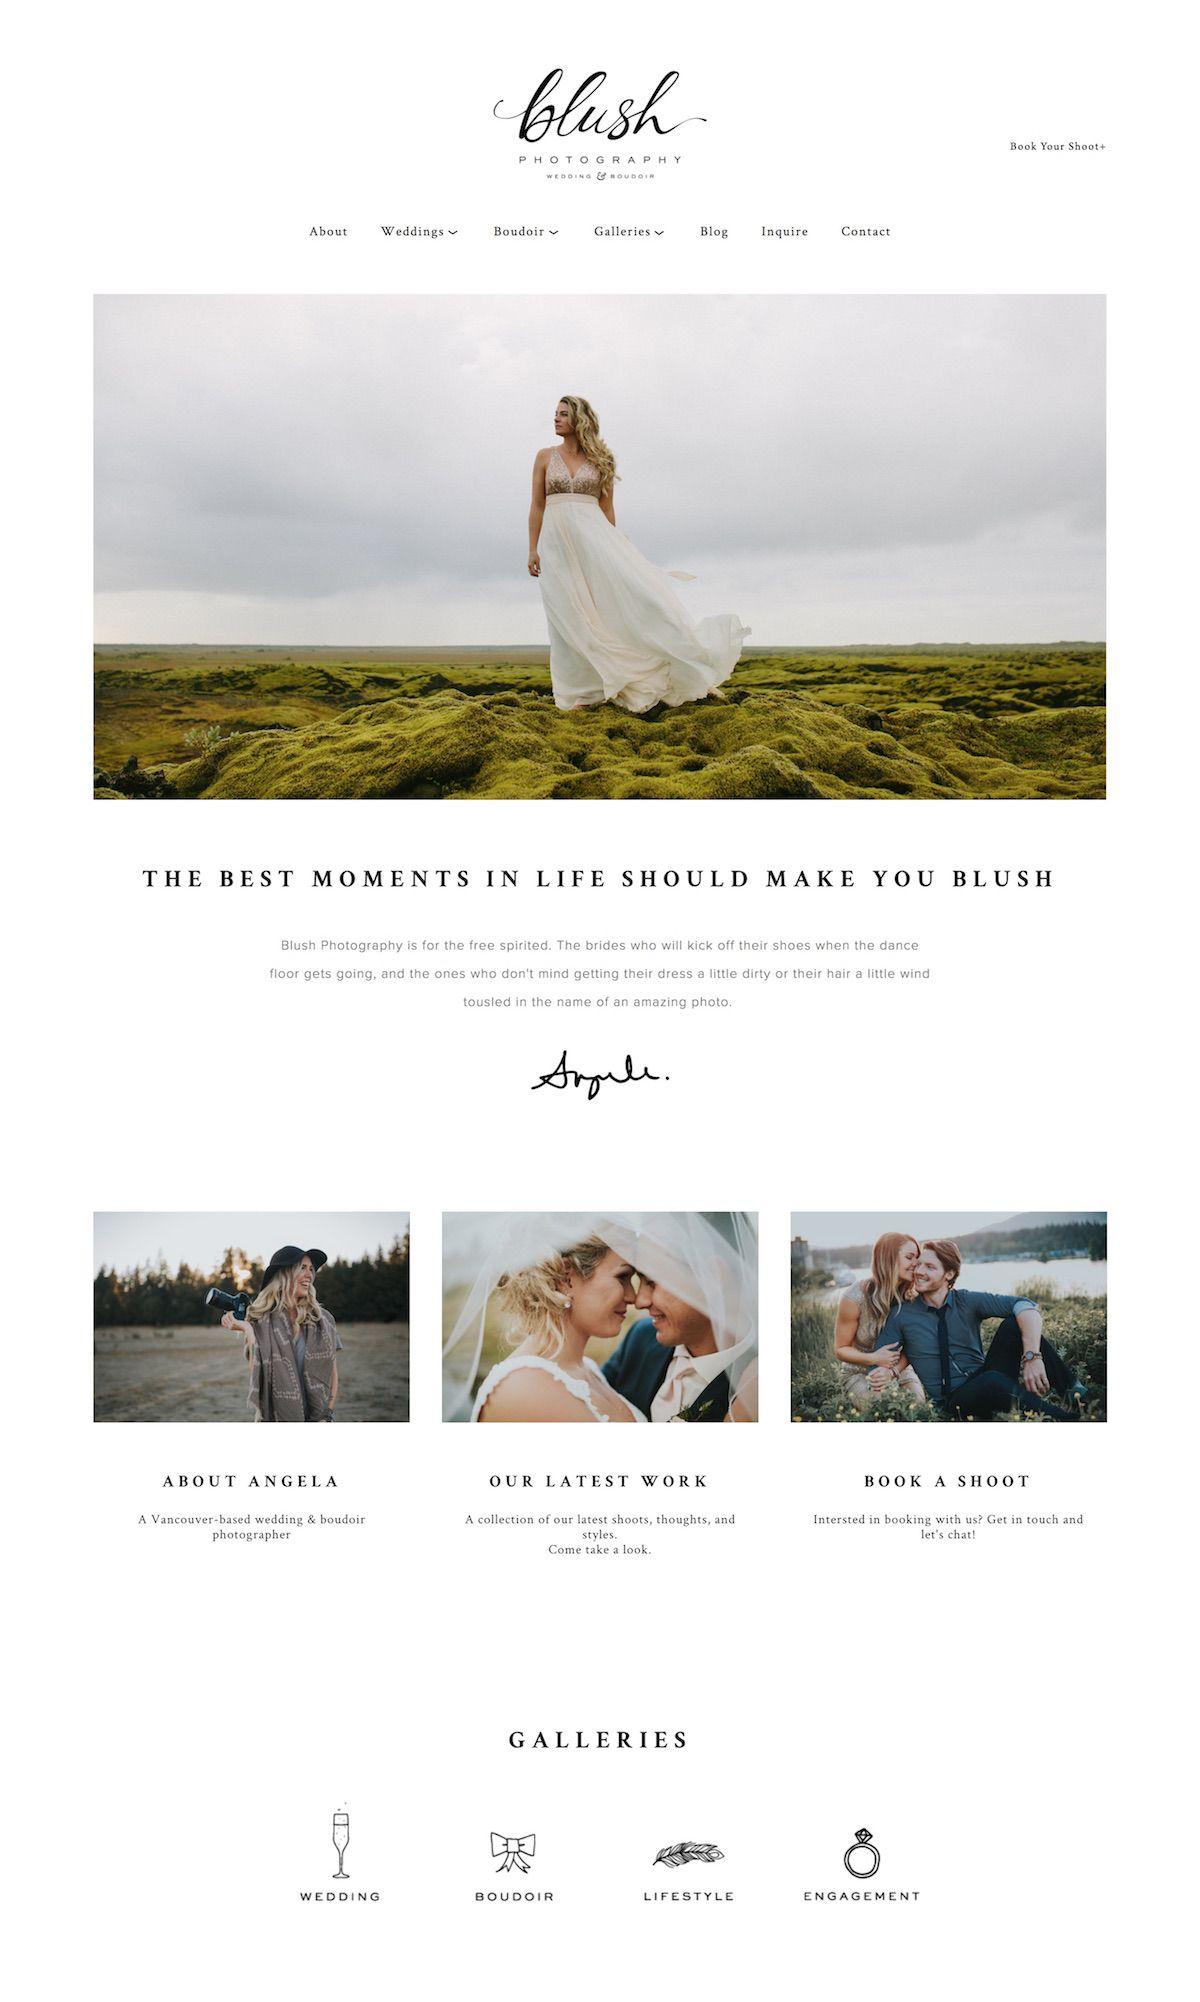 Squarespace 6 Portfolio and Blog Templates: Photographers Who are